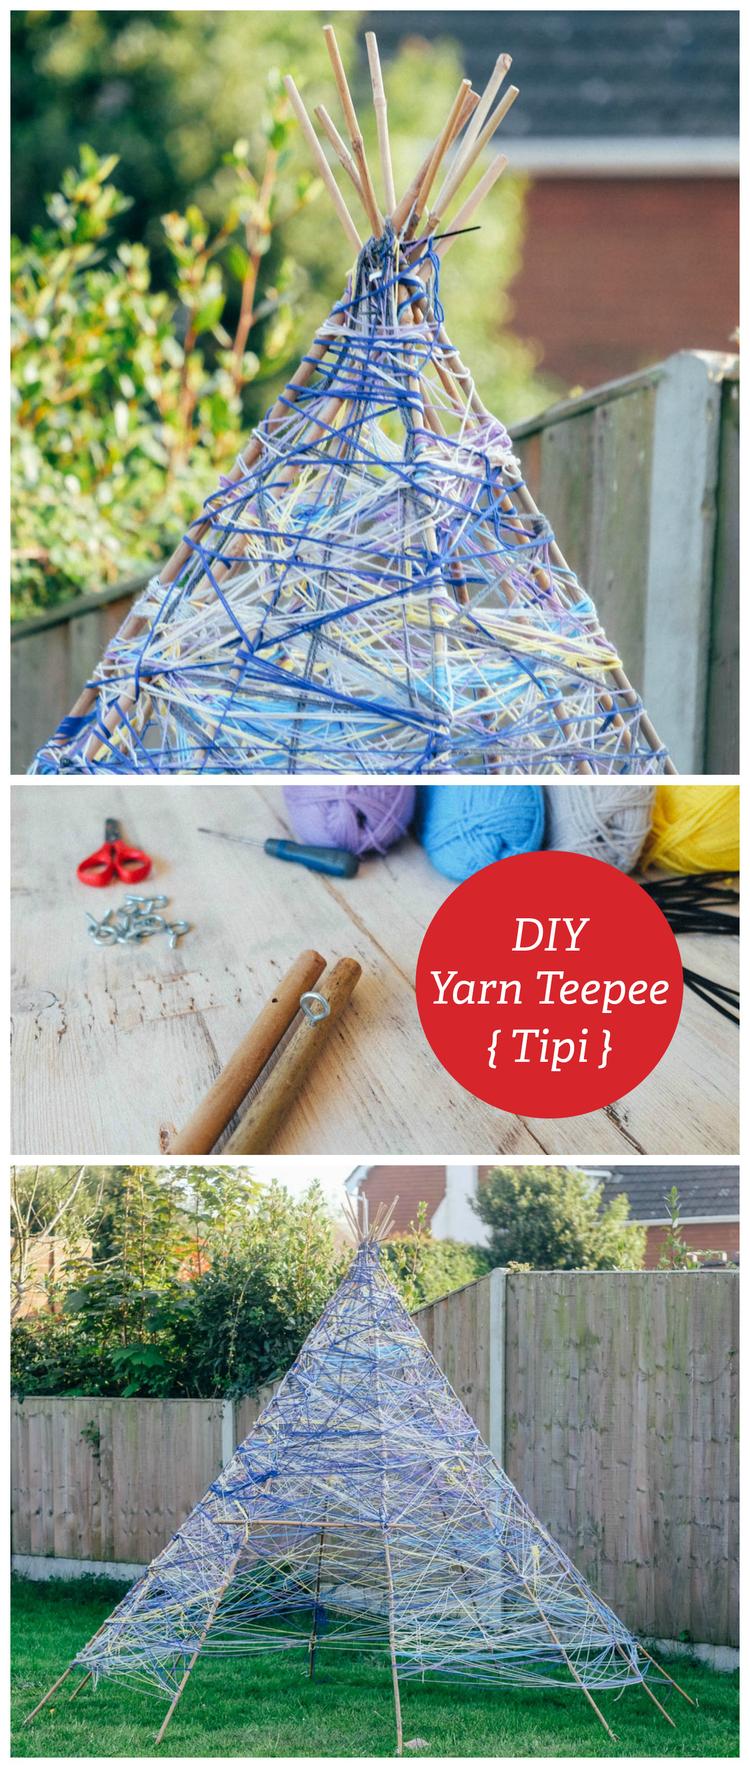 How to make a Yarn Teepee (Tipi) | Easy yarn crafts ...